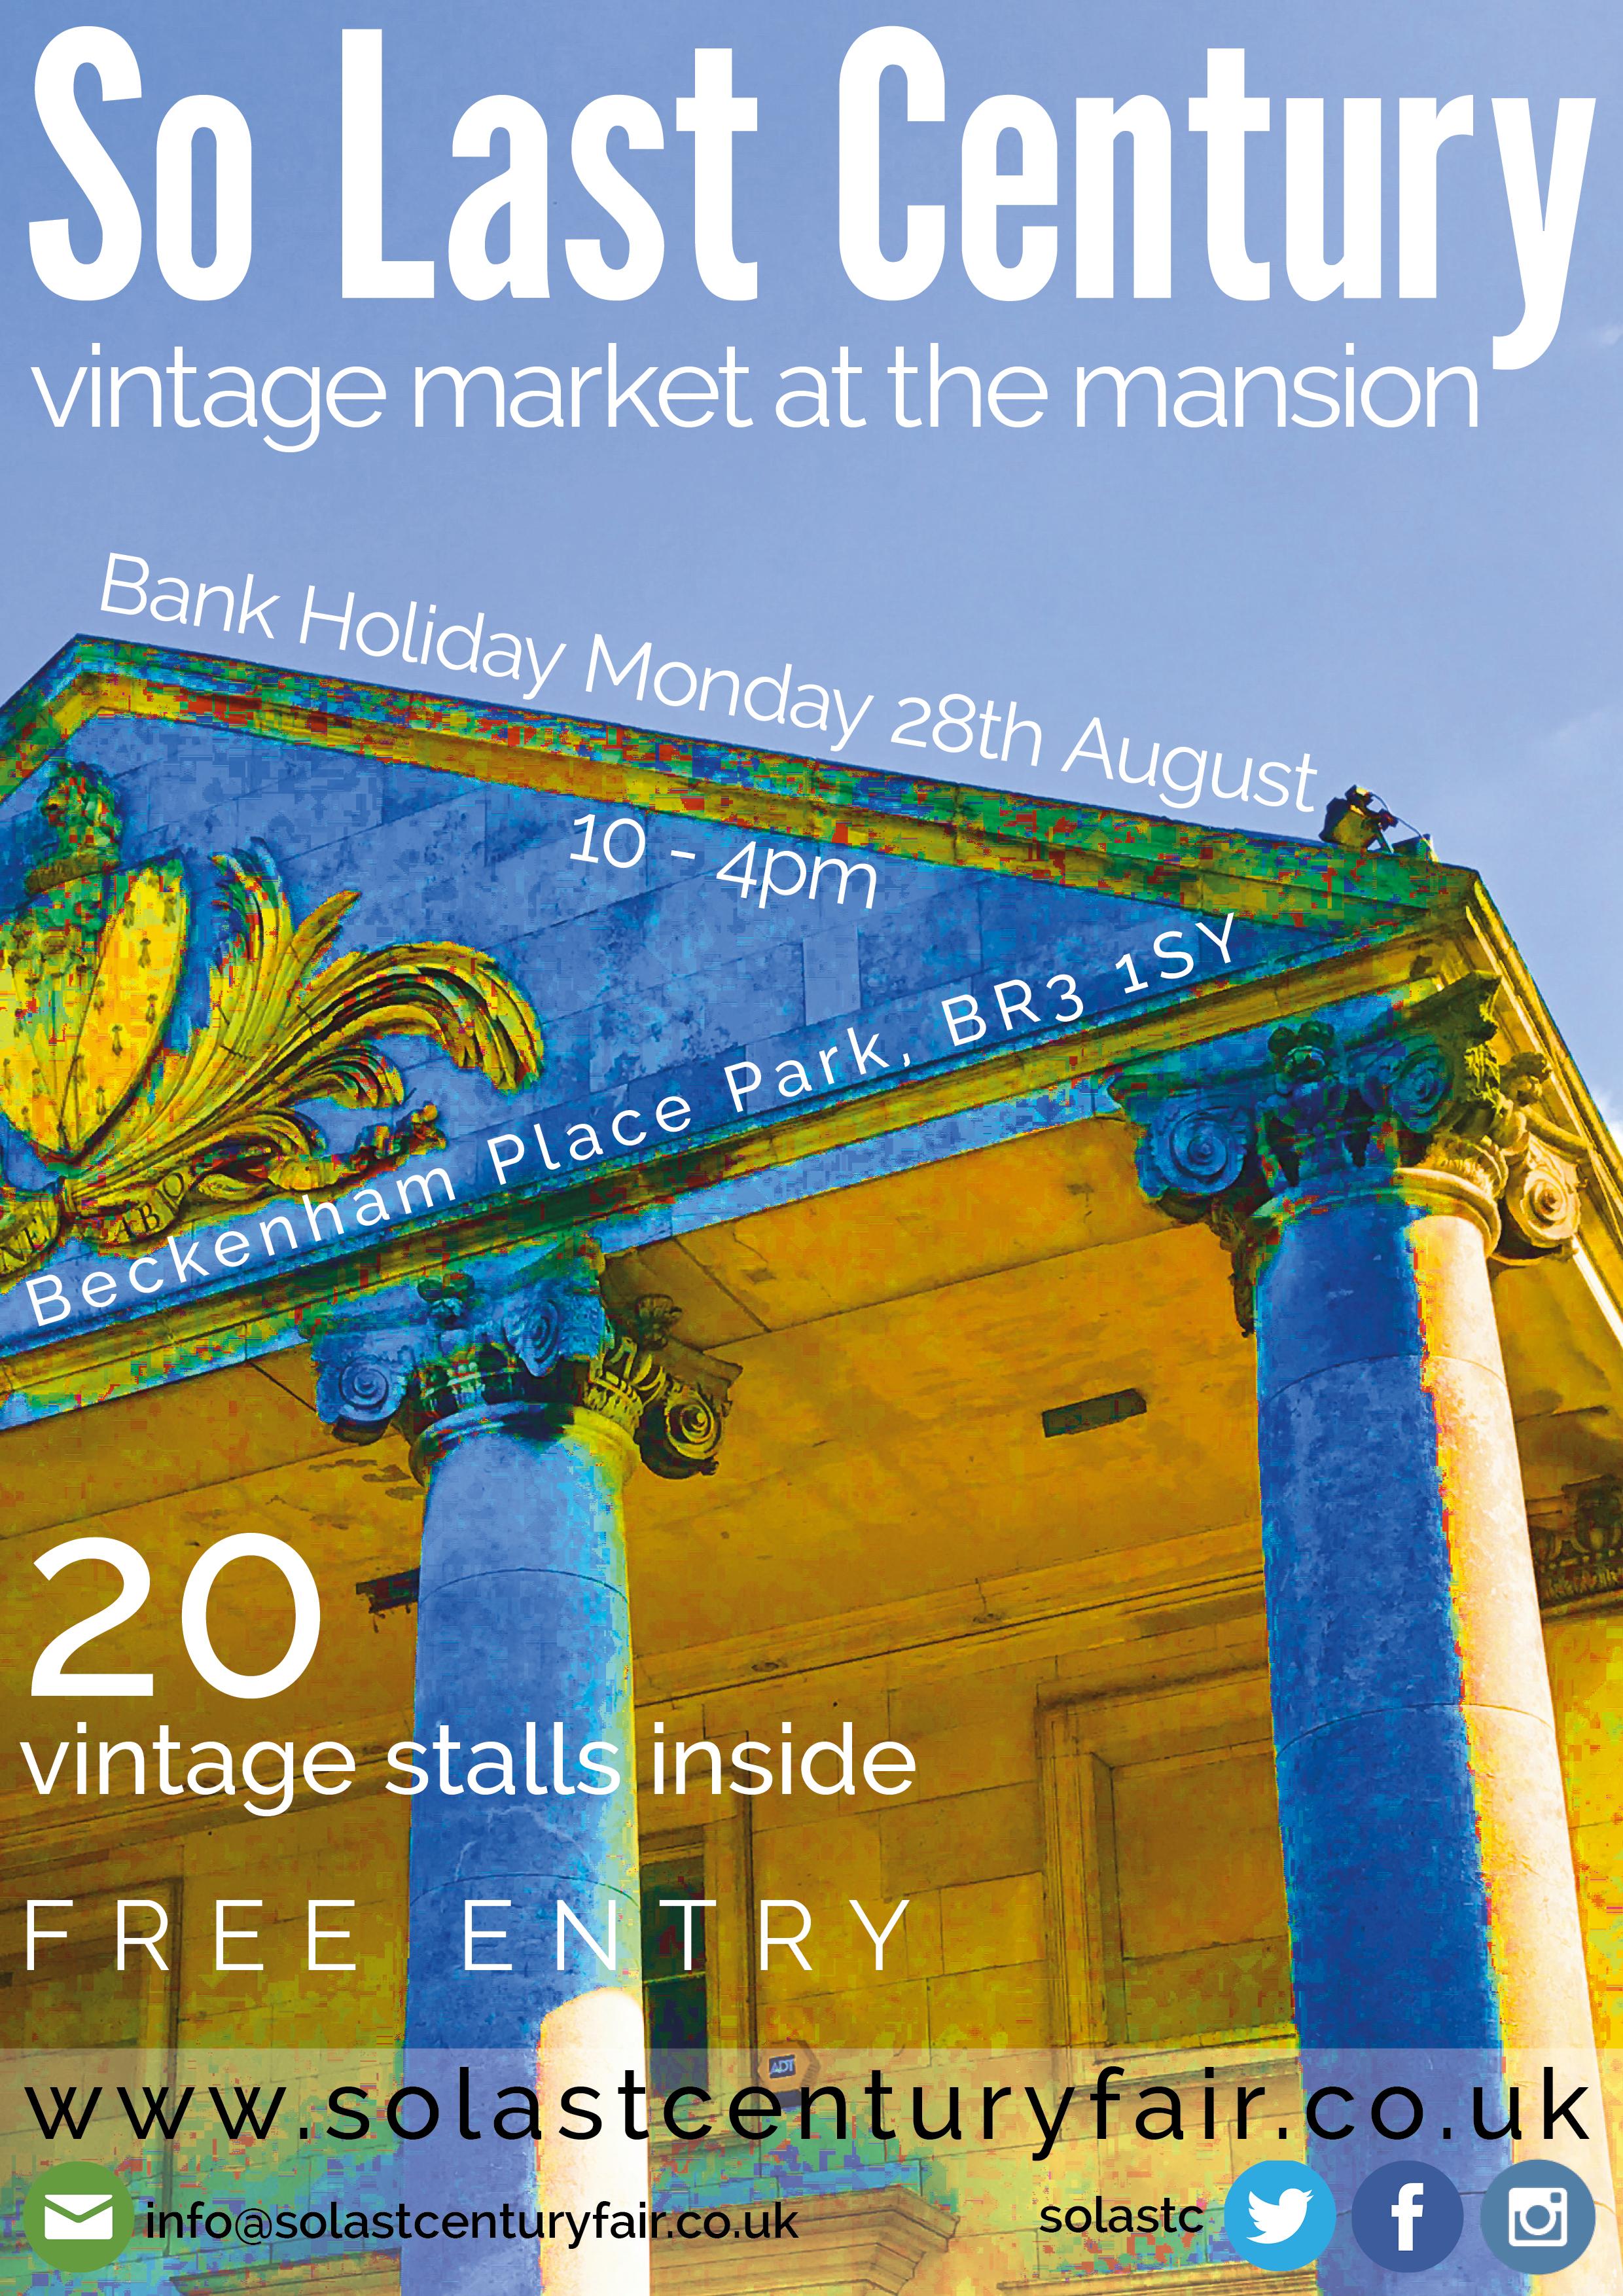 15. Poster Aug 2017 Mansion.jpg